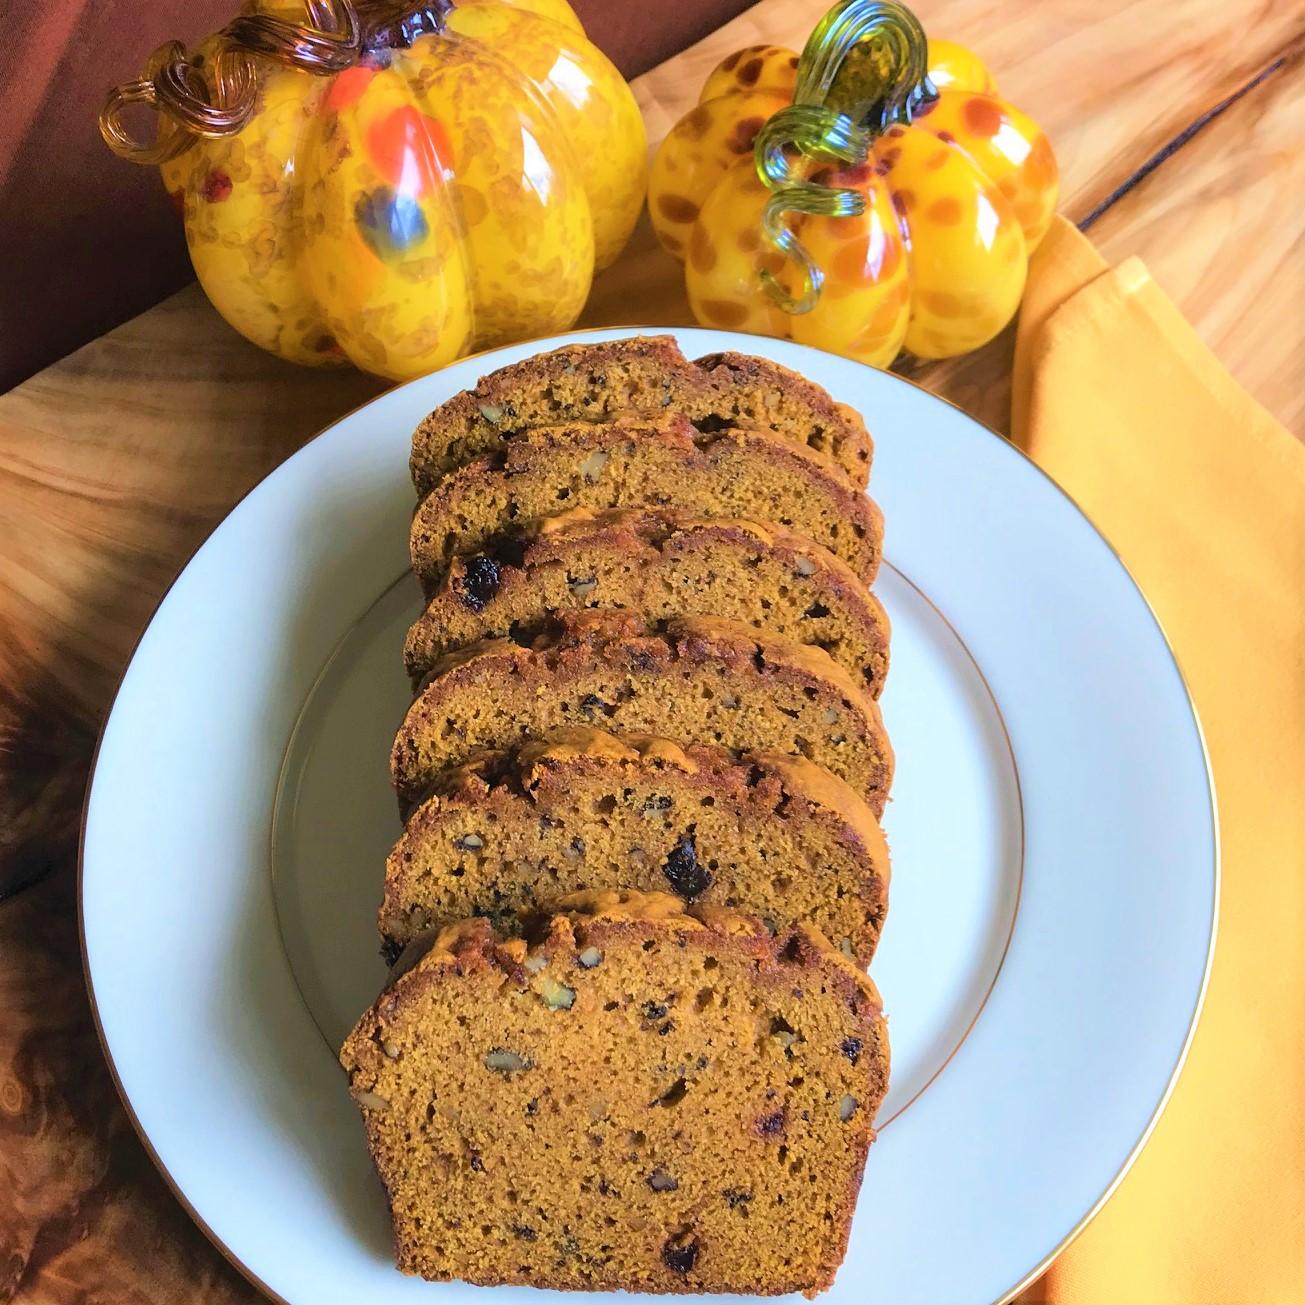 Pumpkin Nut Bread and Batter